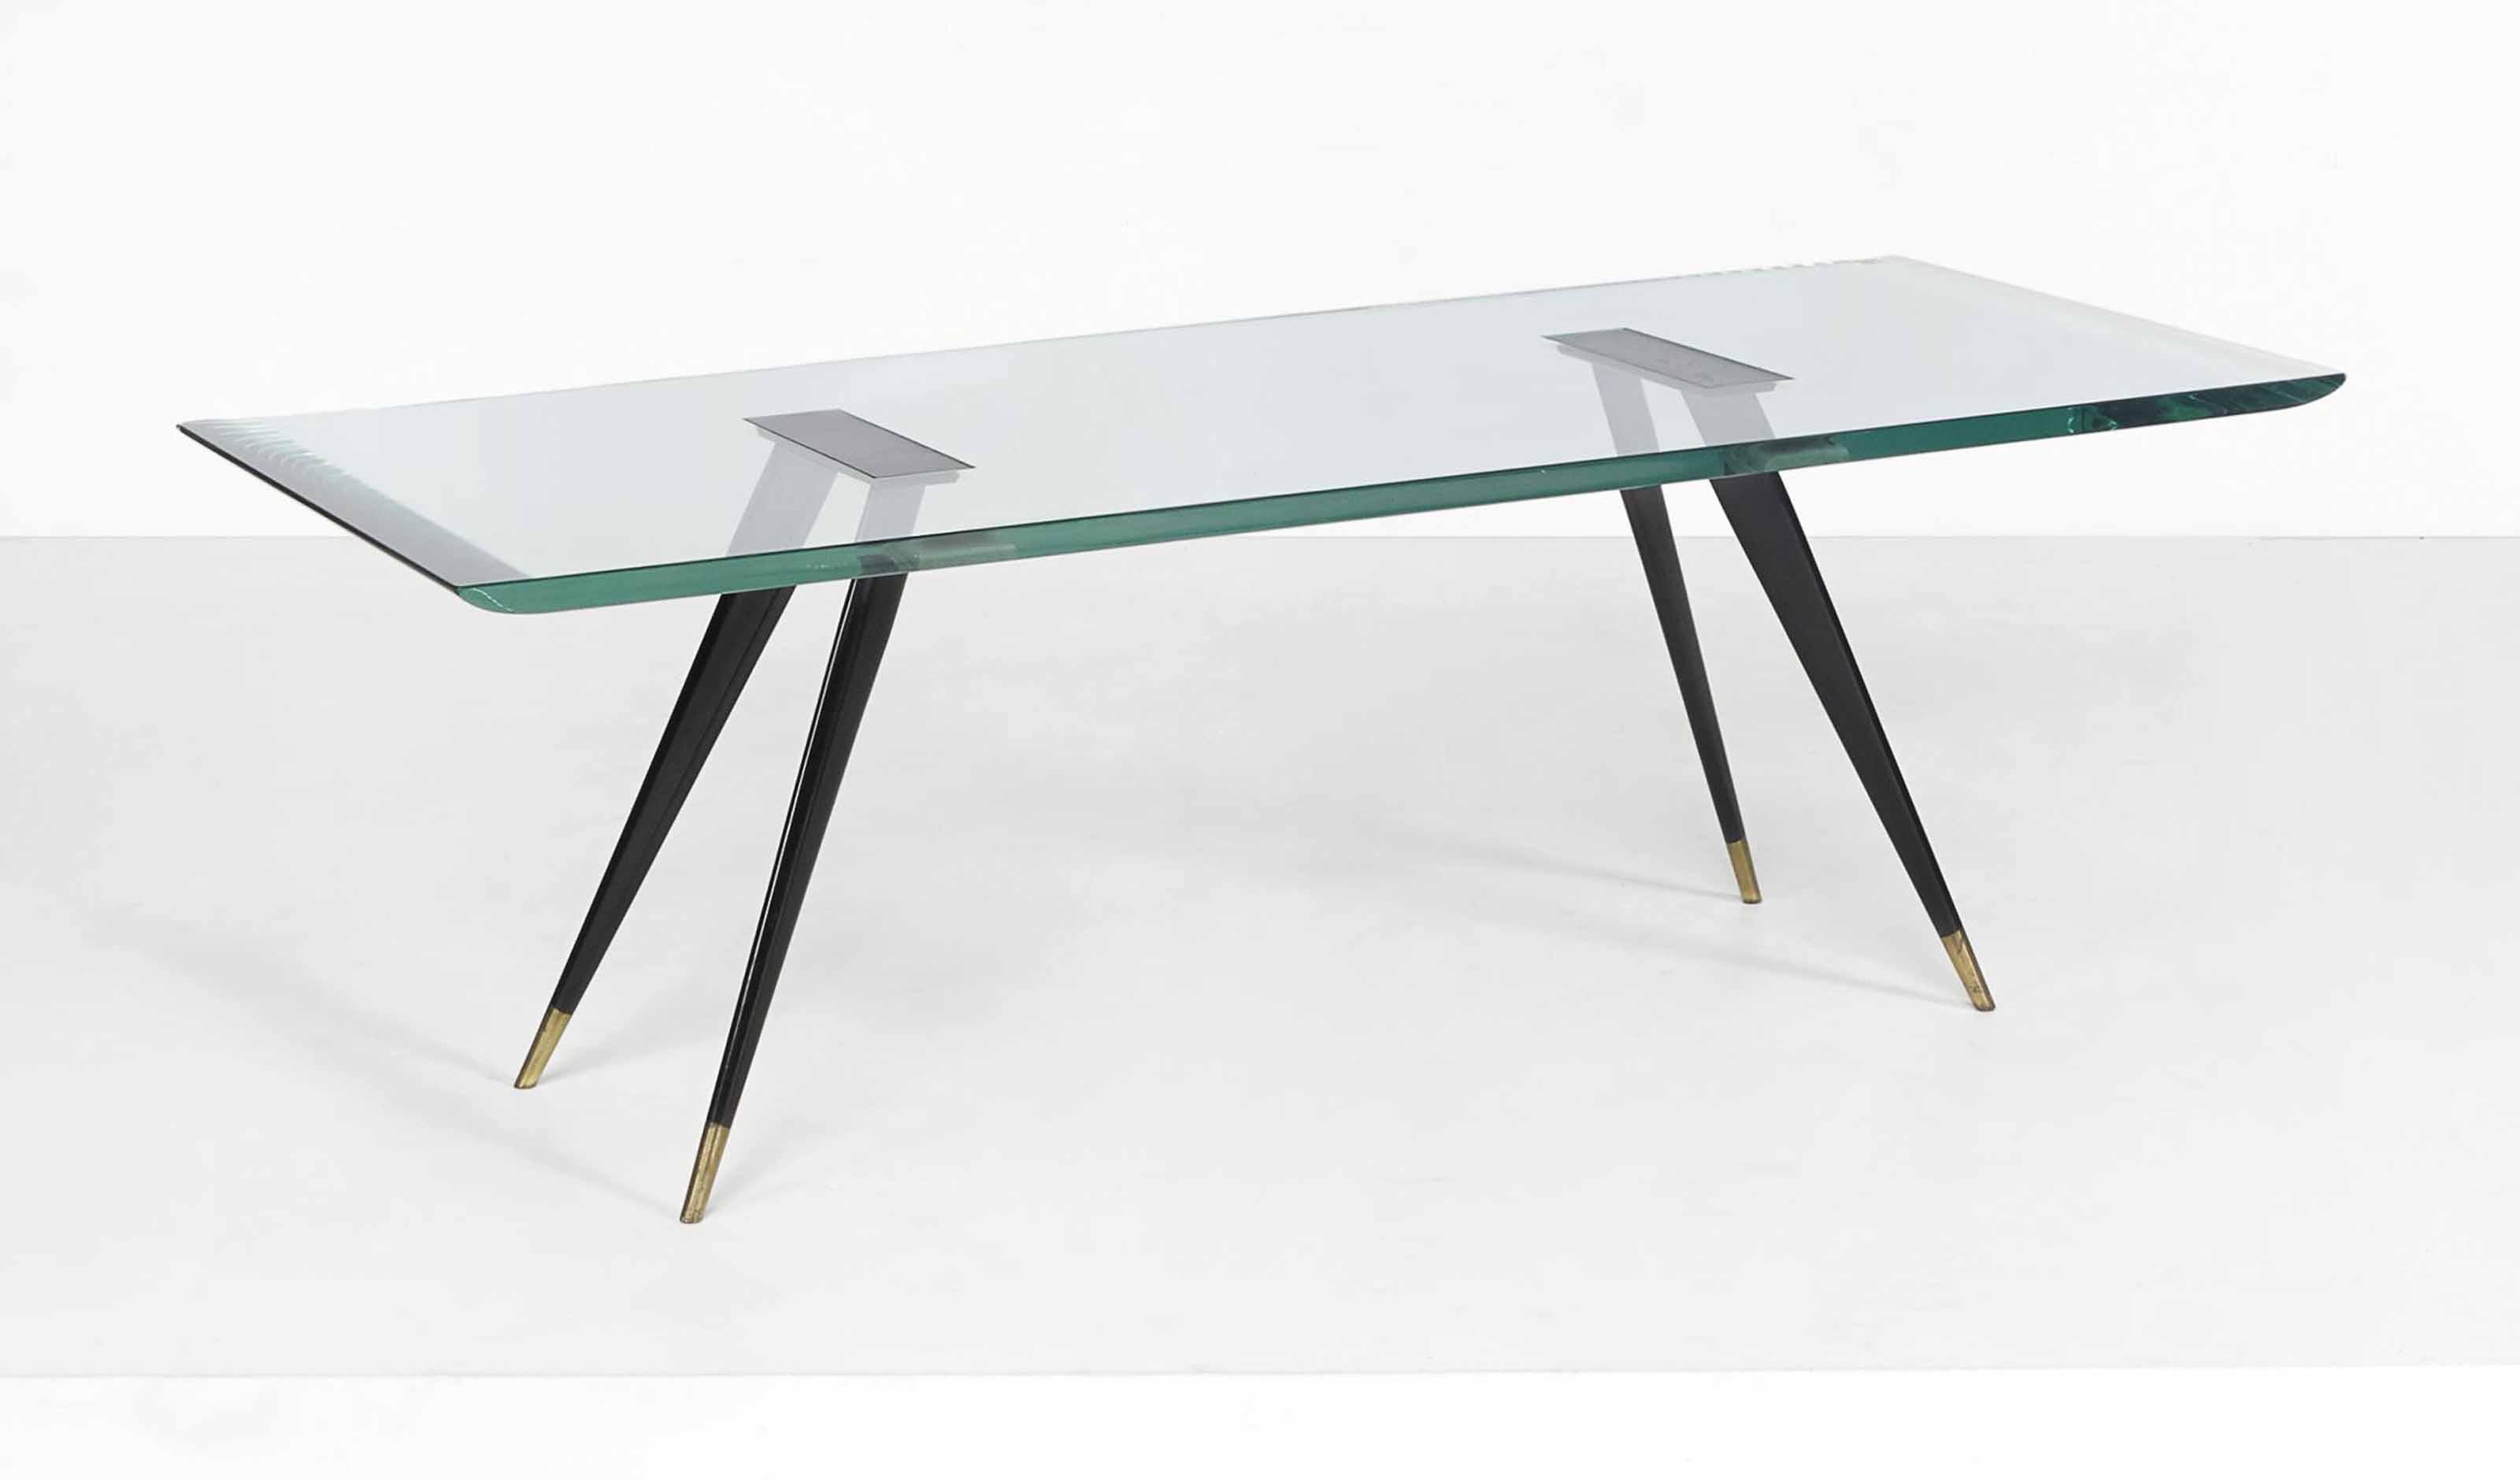 Table Basse Grand Salon fontana arte, le dessin attribue a max ingrand | table basse